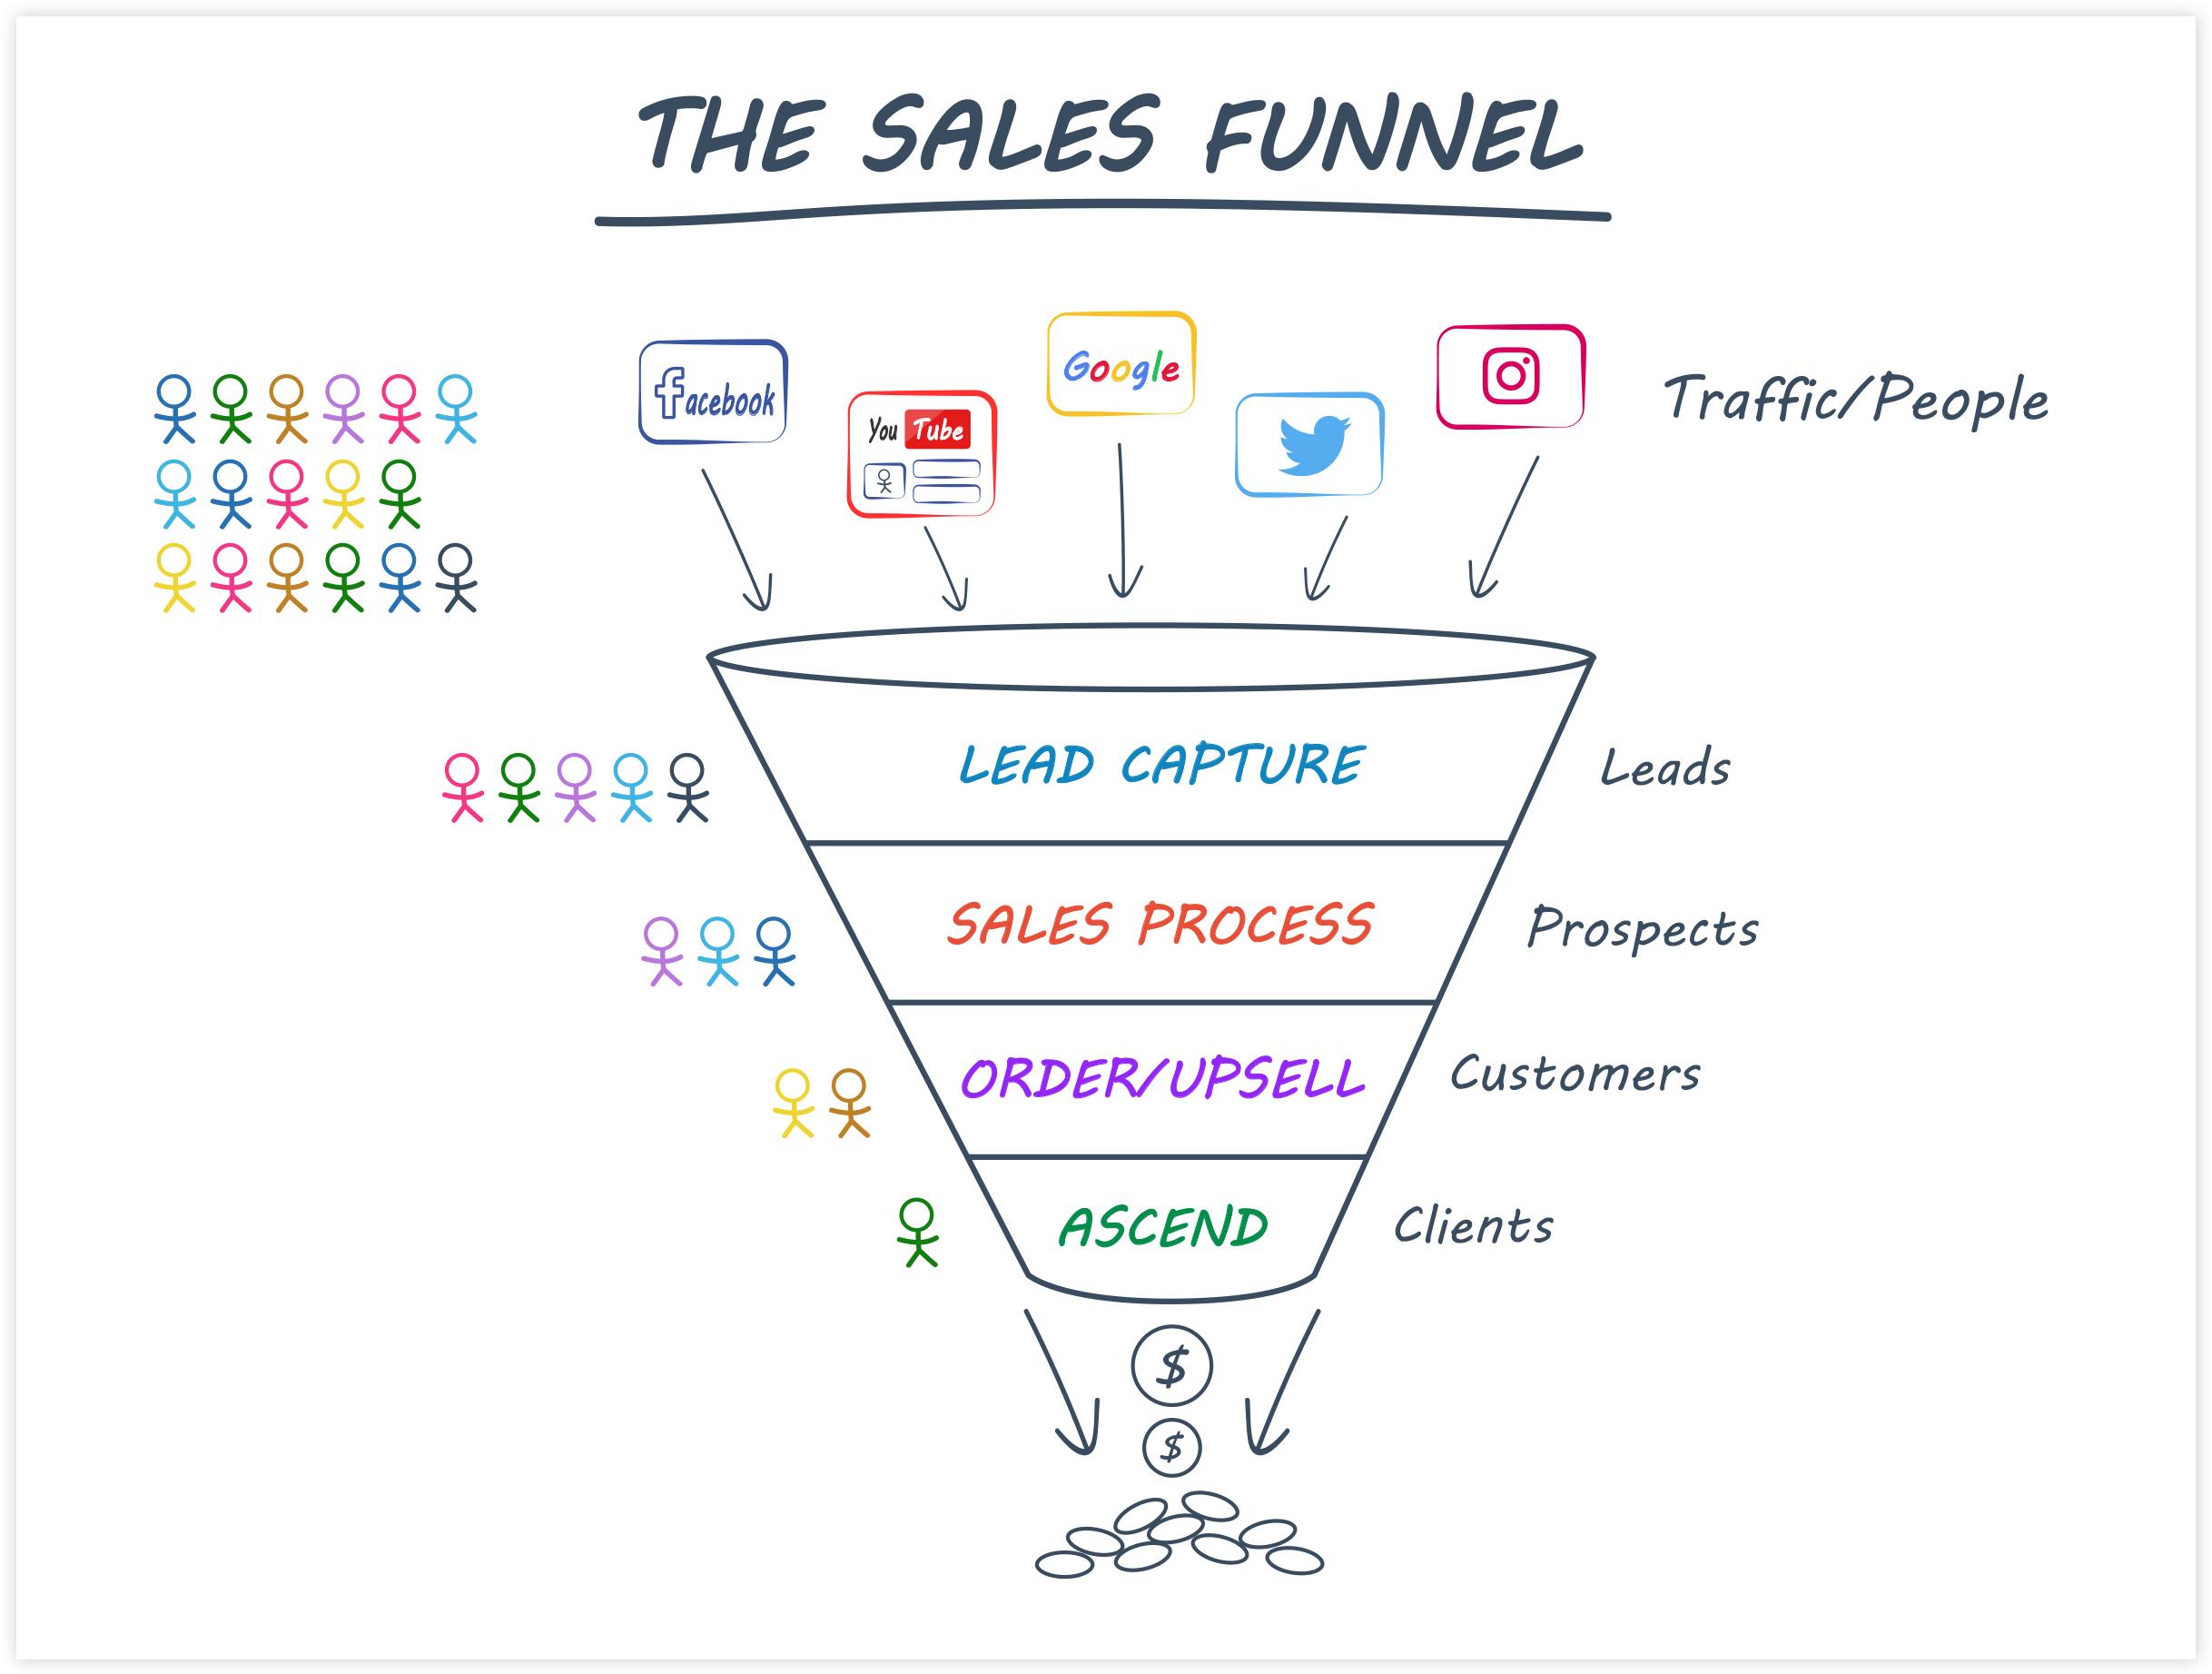 ClickFunnels Sales Funnel Flow Diagram